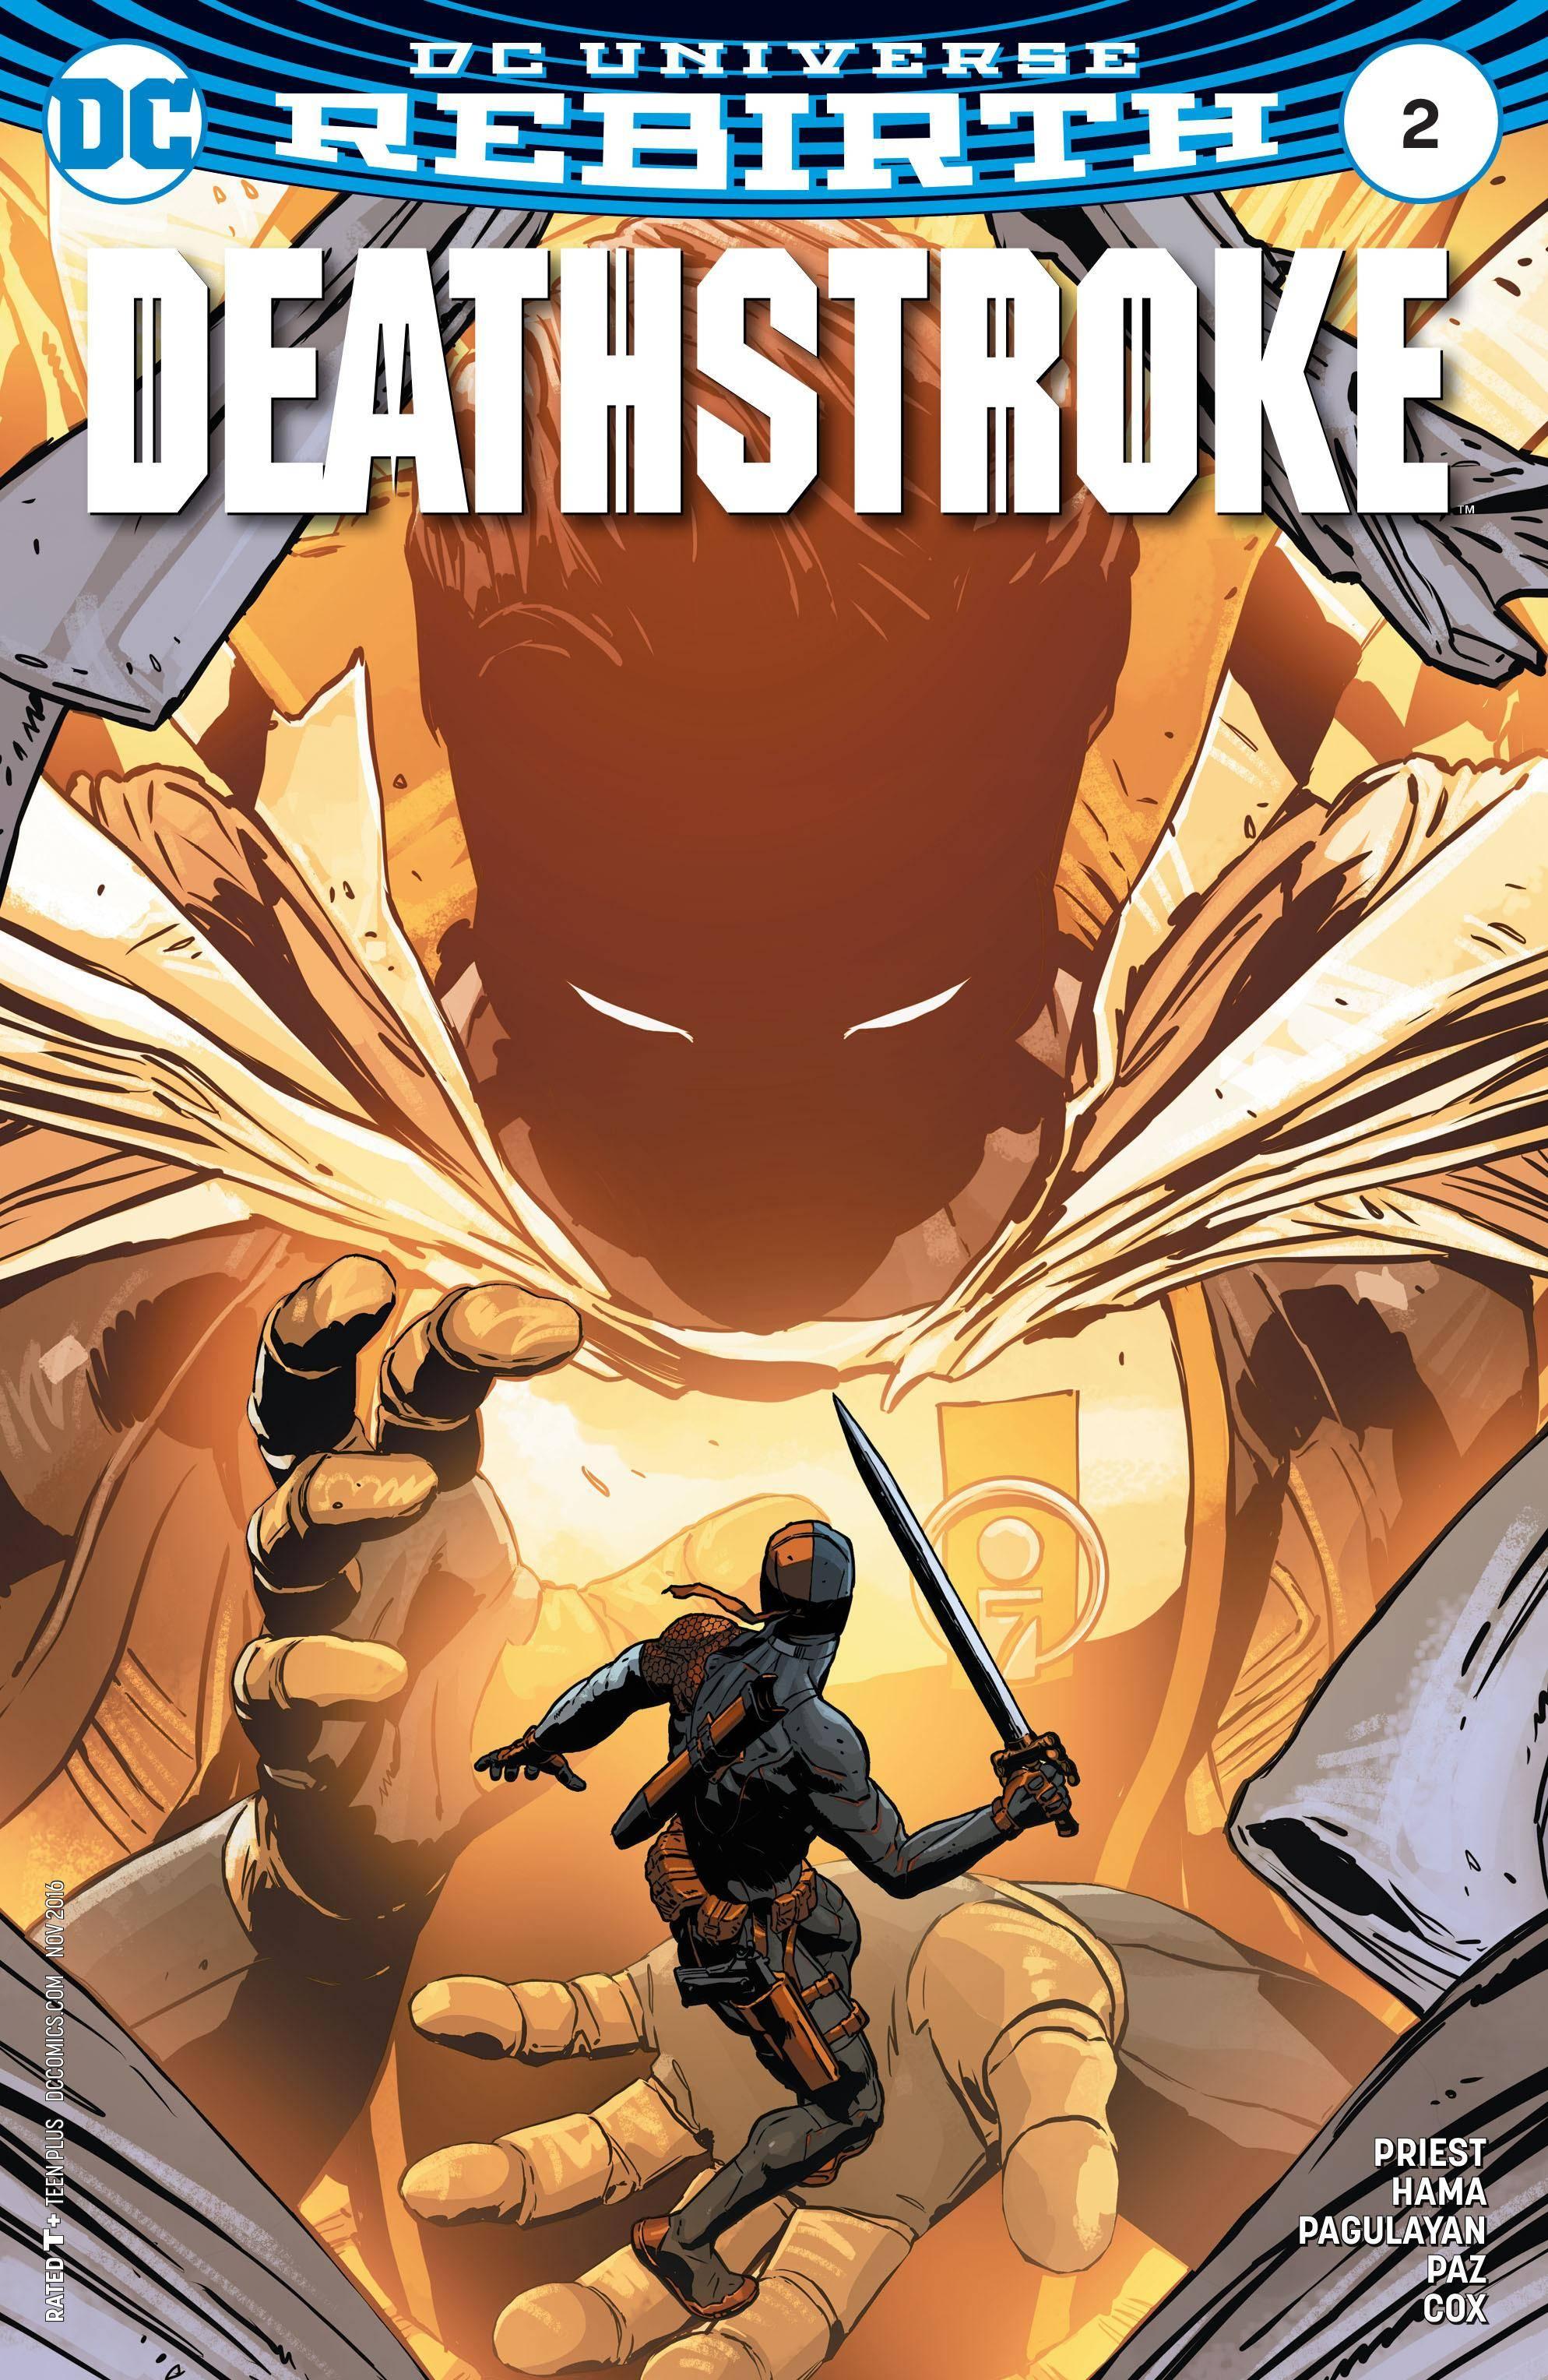 Deathstroke 002 2016 2 covers Digital Zone-Empire